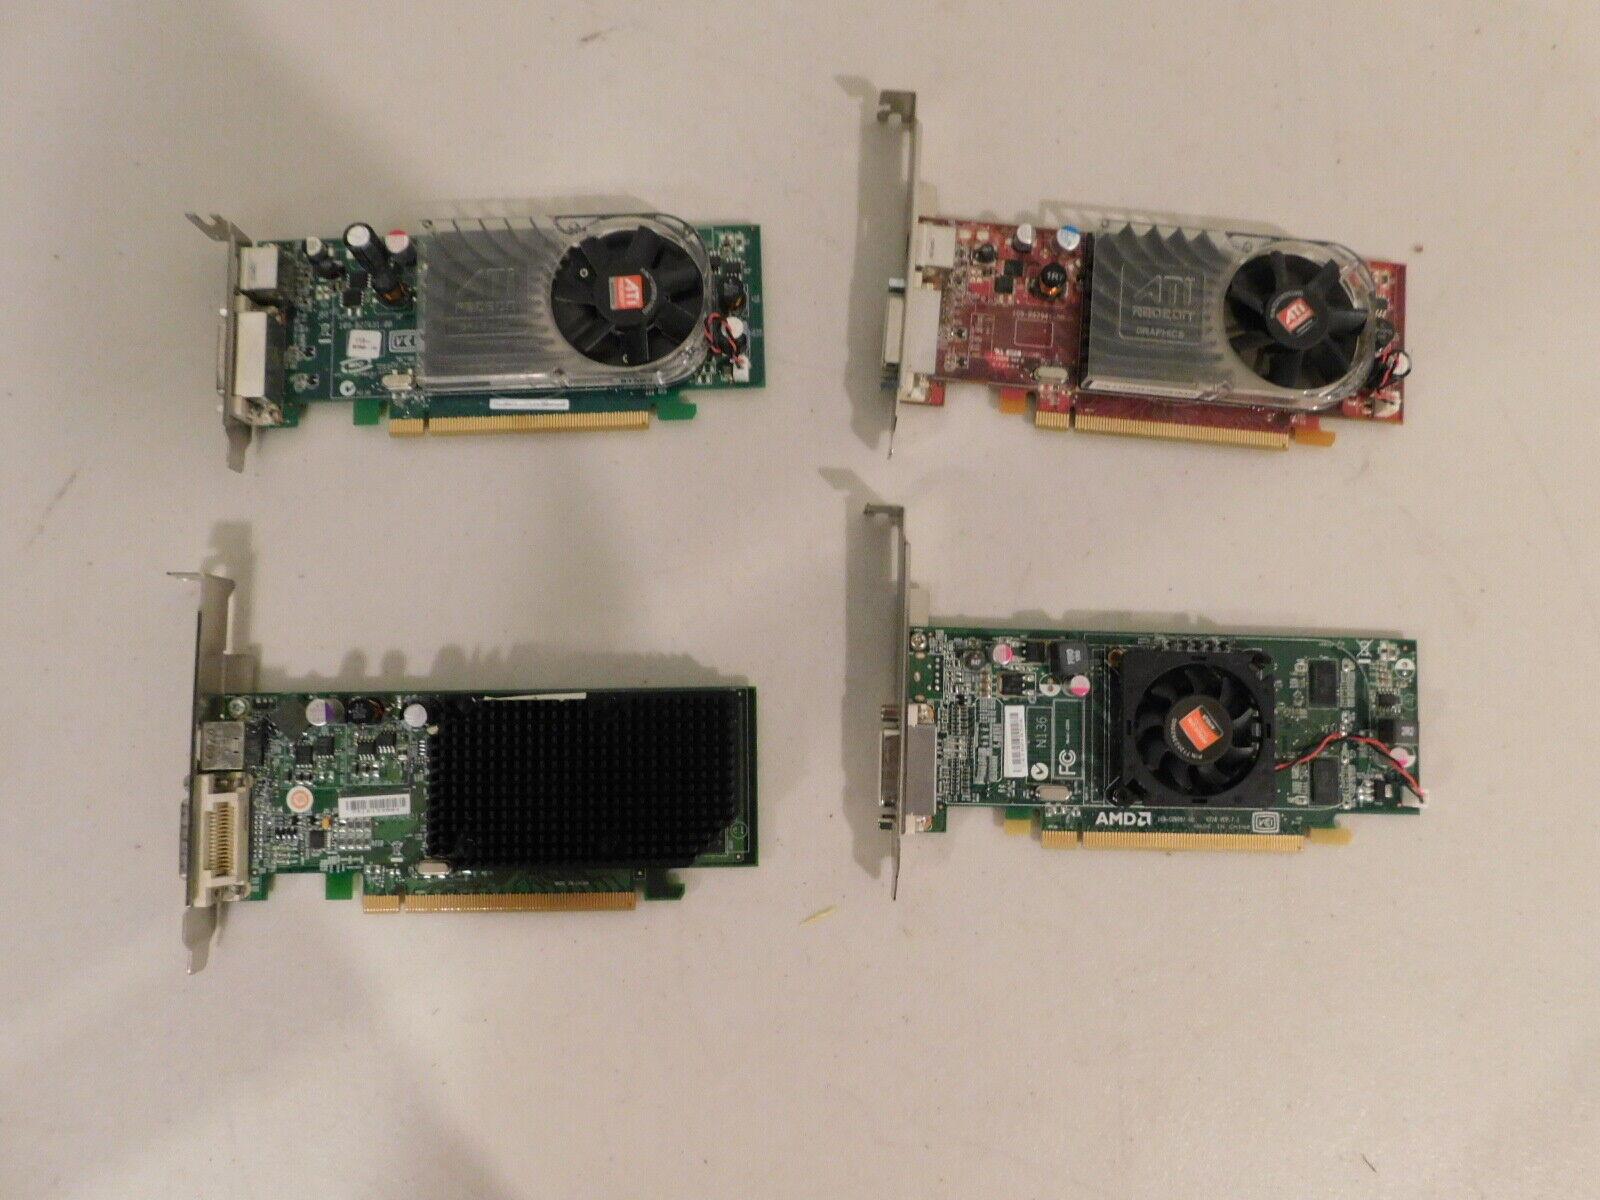 Lot of 4 AMD/ATI PCI-E x16 Desktop Video Graphic Cards 236X5 0GJ501 0X398D 0XX35